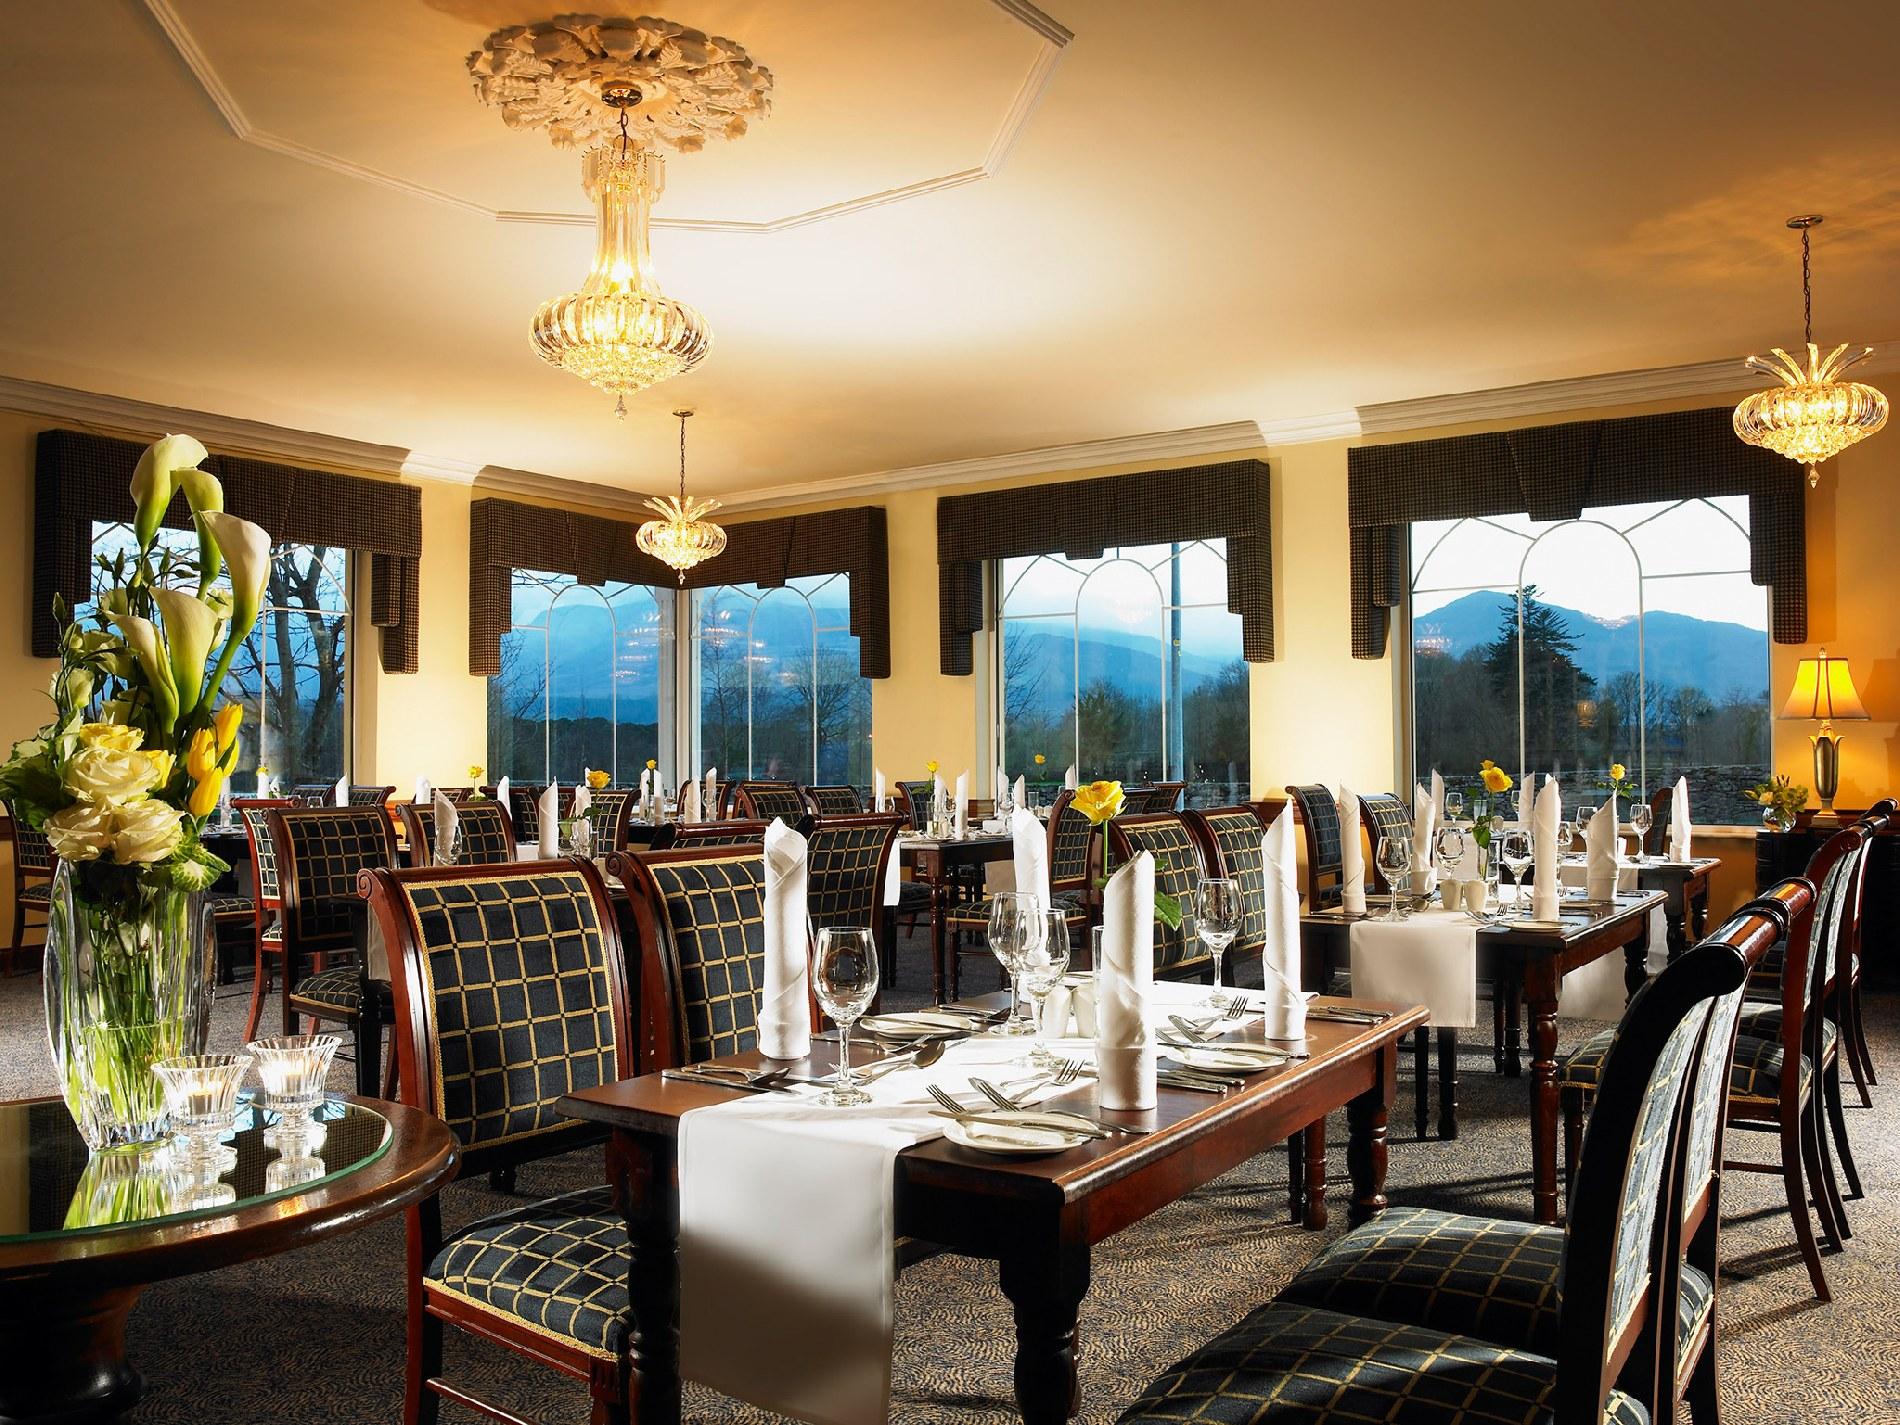 Restaurants in Killarney Flesk Restaurant and OD s